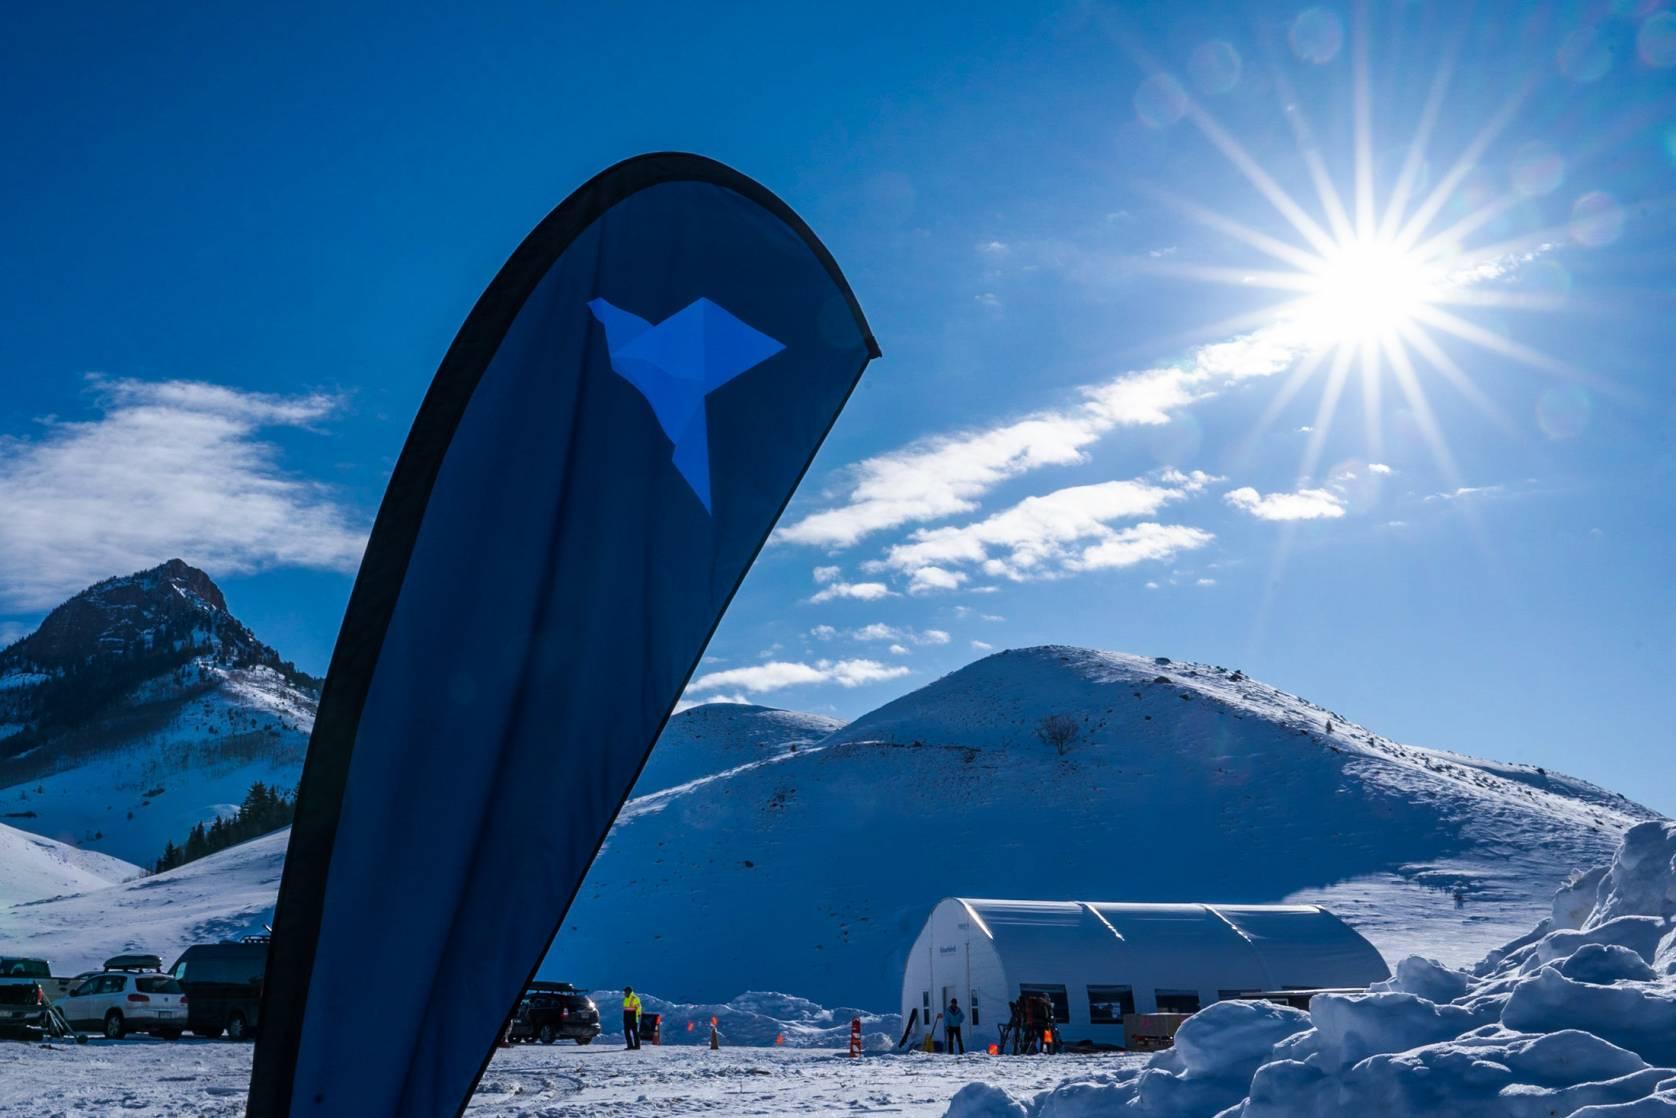 Bluebird Backcountry ski area